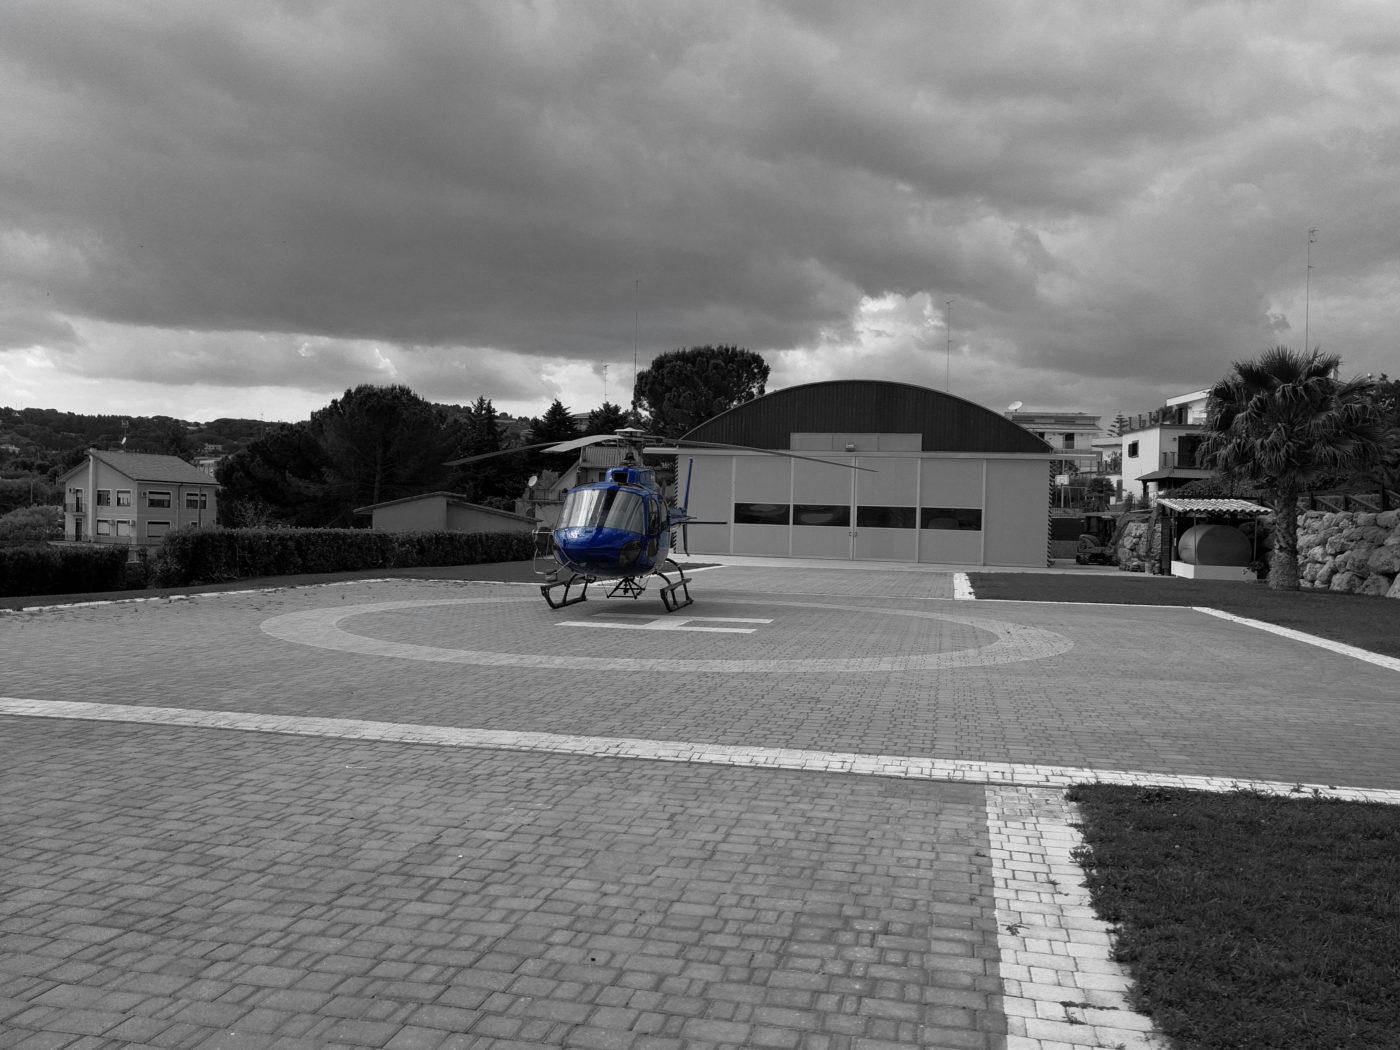 affittare elicottero Sicilia